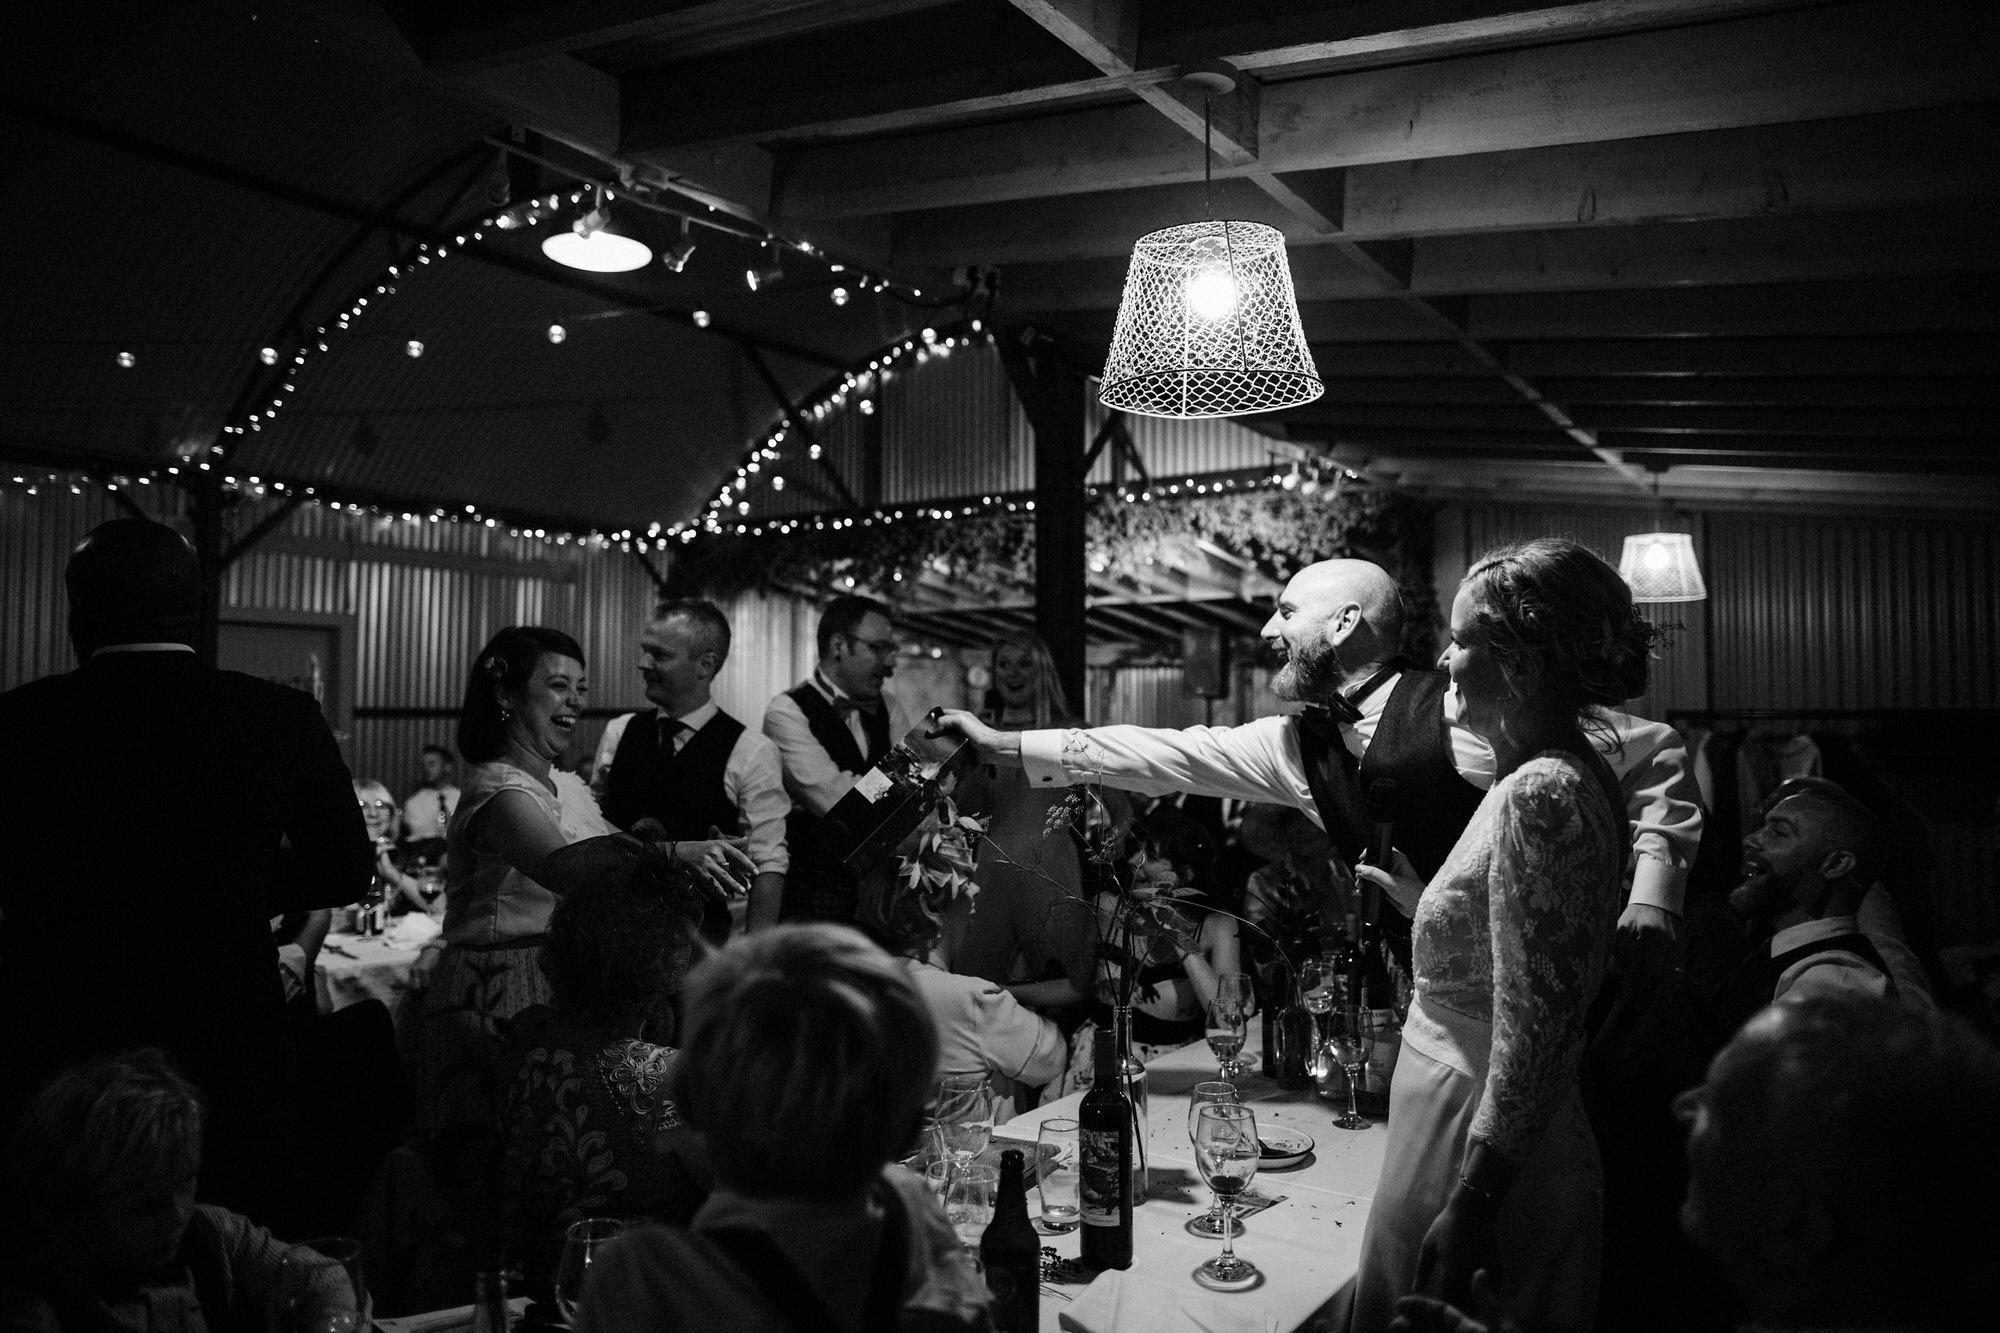 075 TIN SHED KNOCKRAICH WEDDING AUTUMN ZOE ALEXANDRA PHOTOGRAPHY